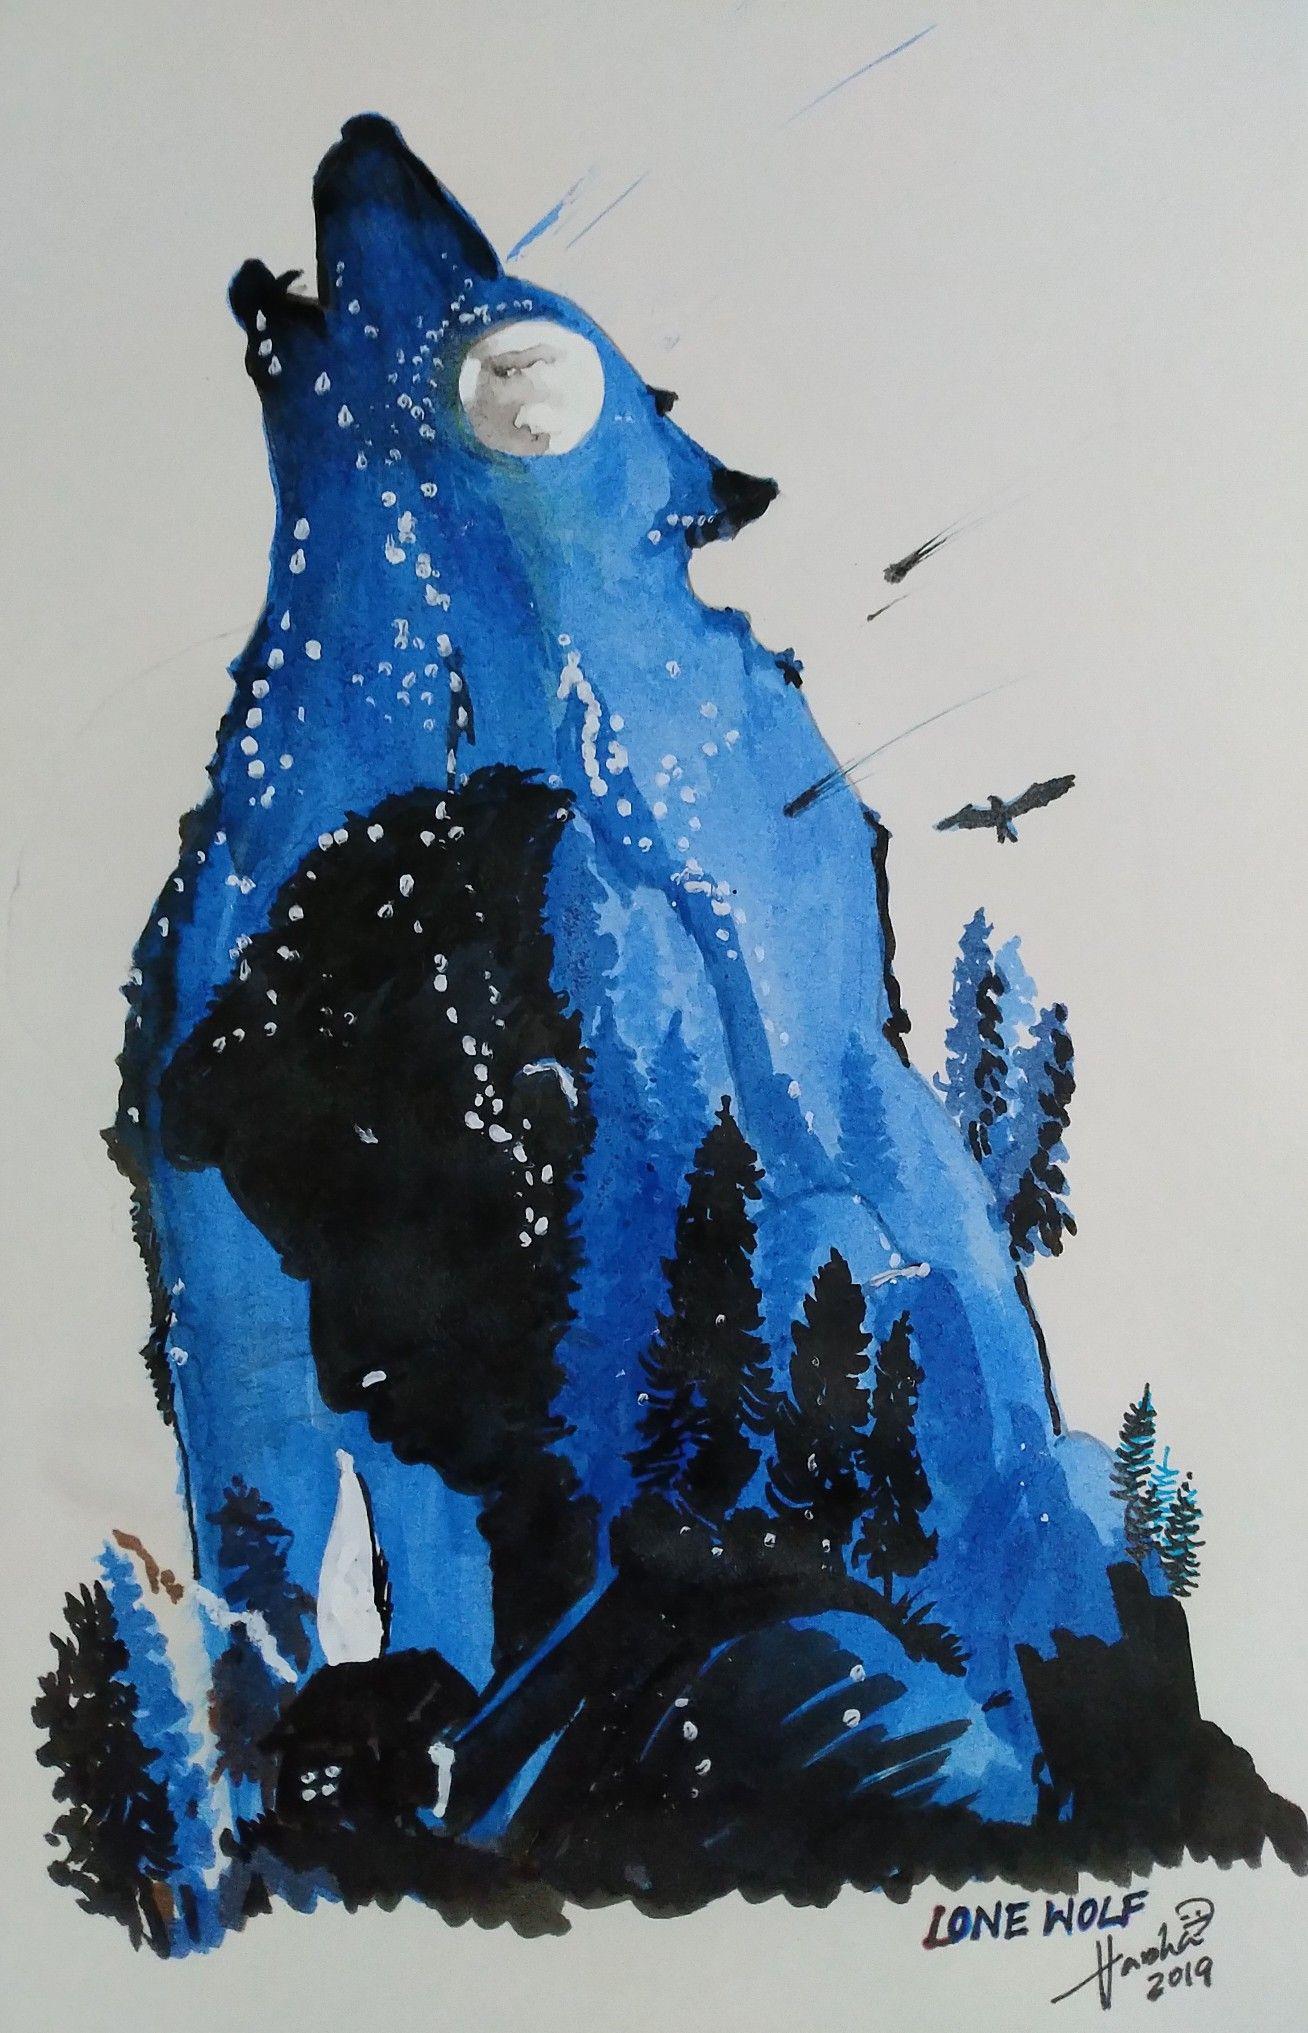 Lone wolf lone wolf sketch book art